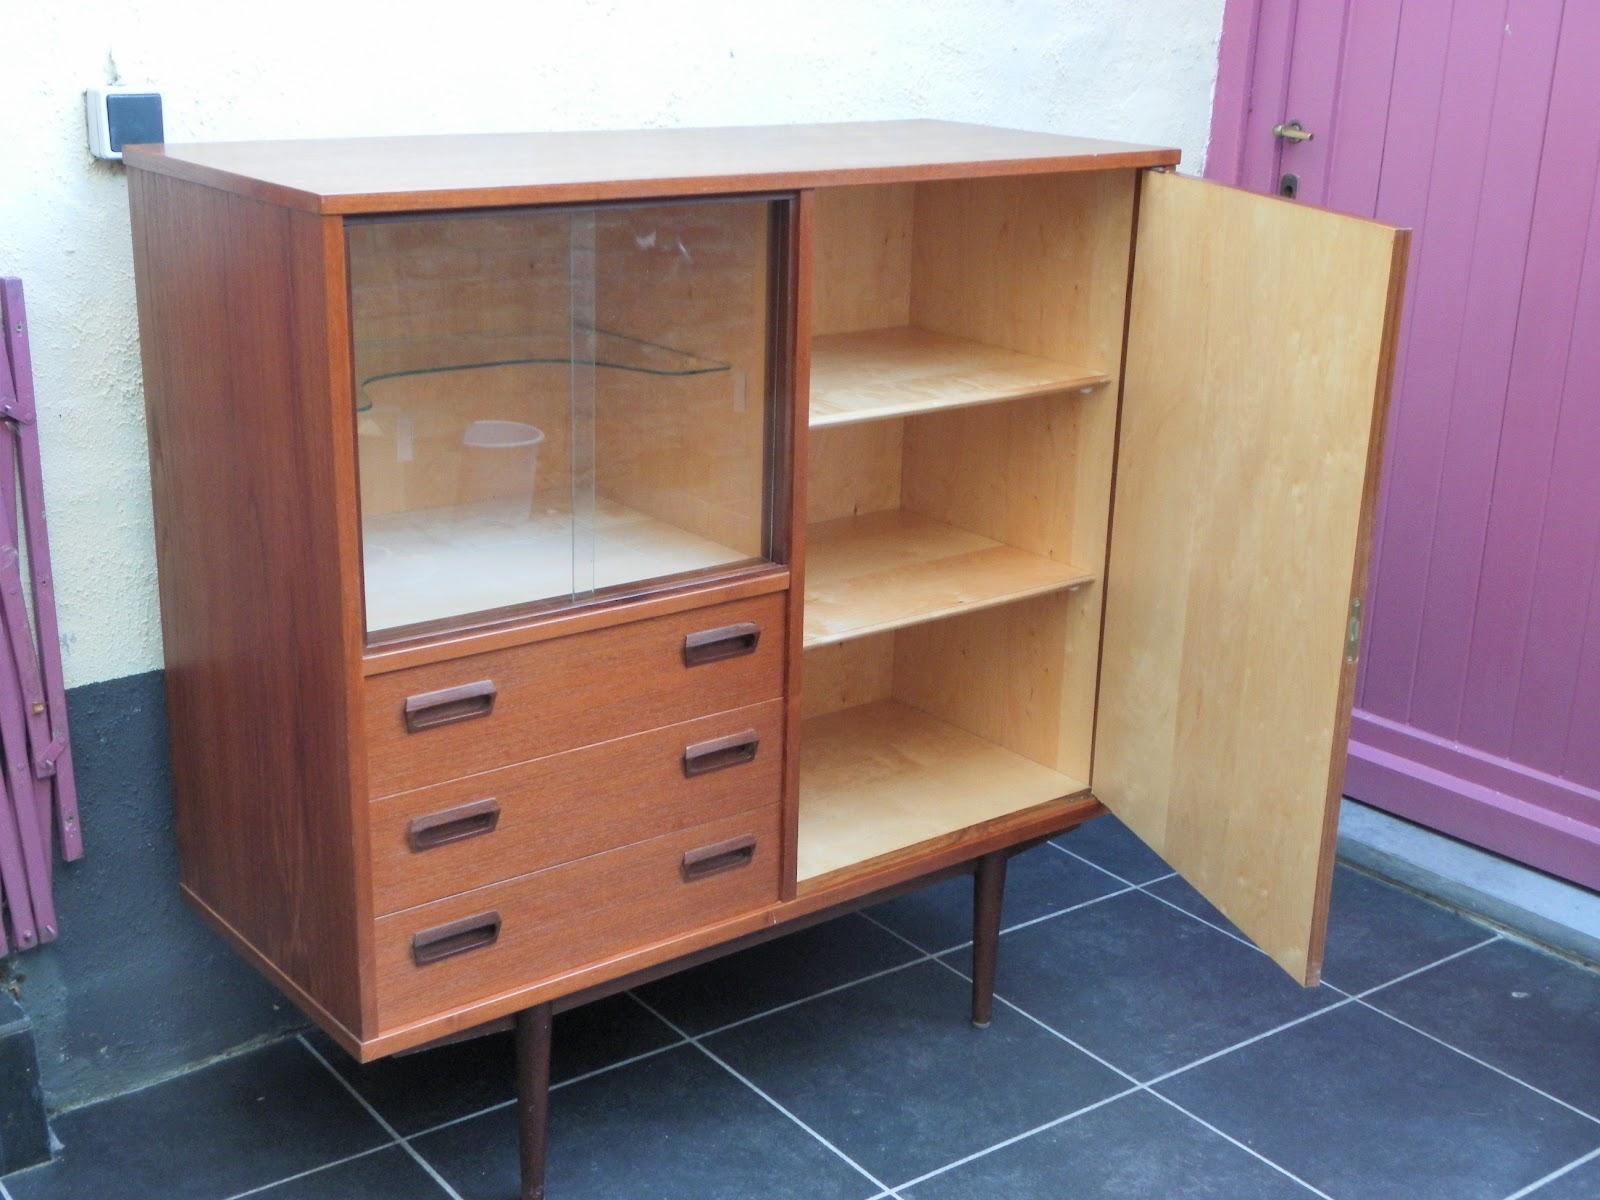 lucie la chineuse meuble vitrine ann e 60. Black Bedroom Furniture Sets. Home Design Ideas